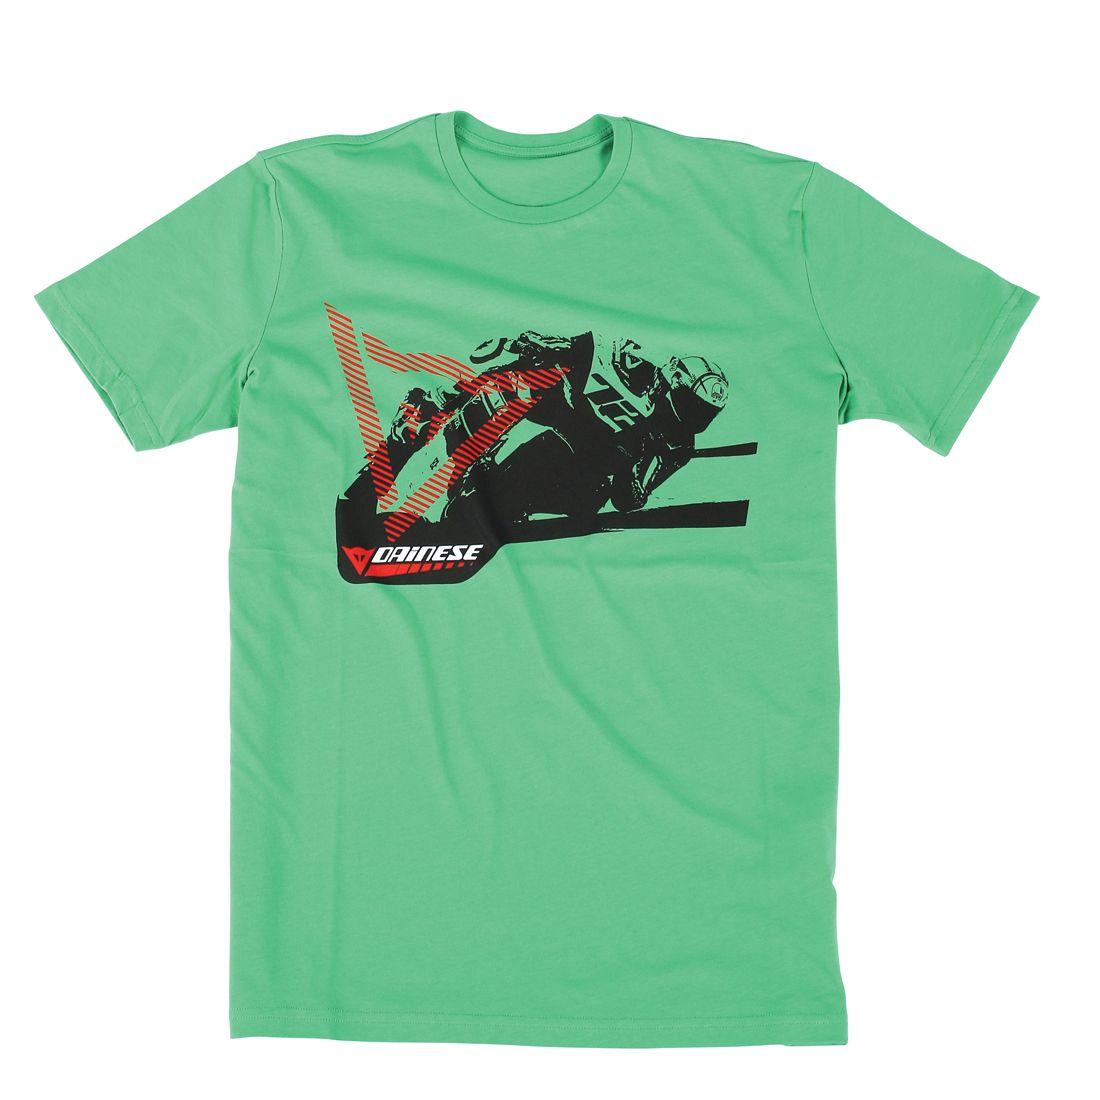 【DAINESE】GRIPPING T恤 - 「Webike-摩托百貨」